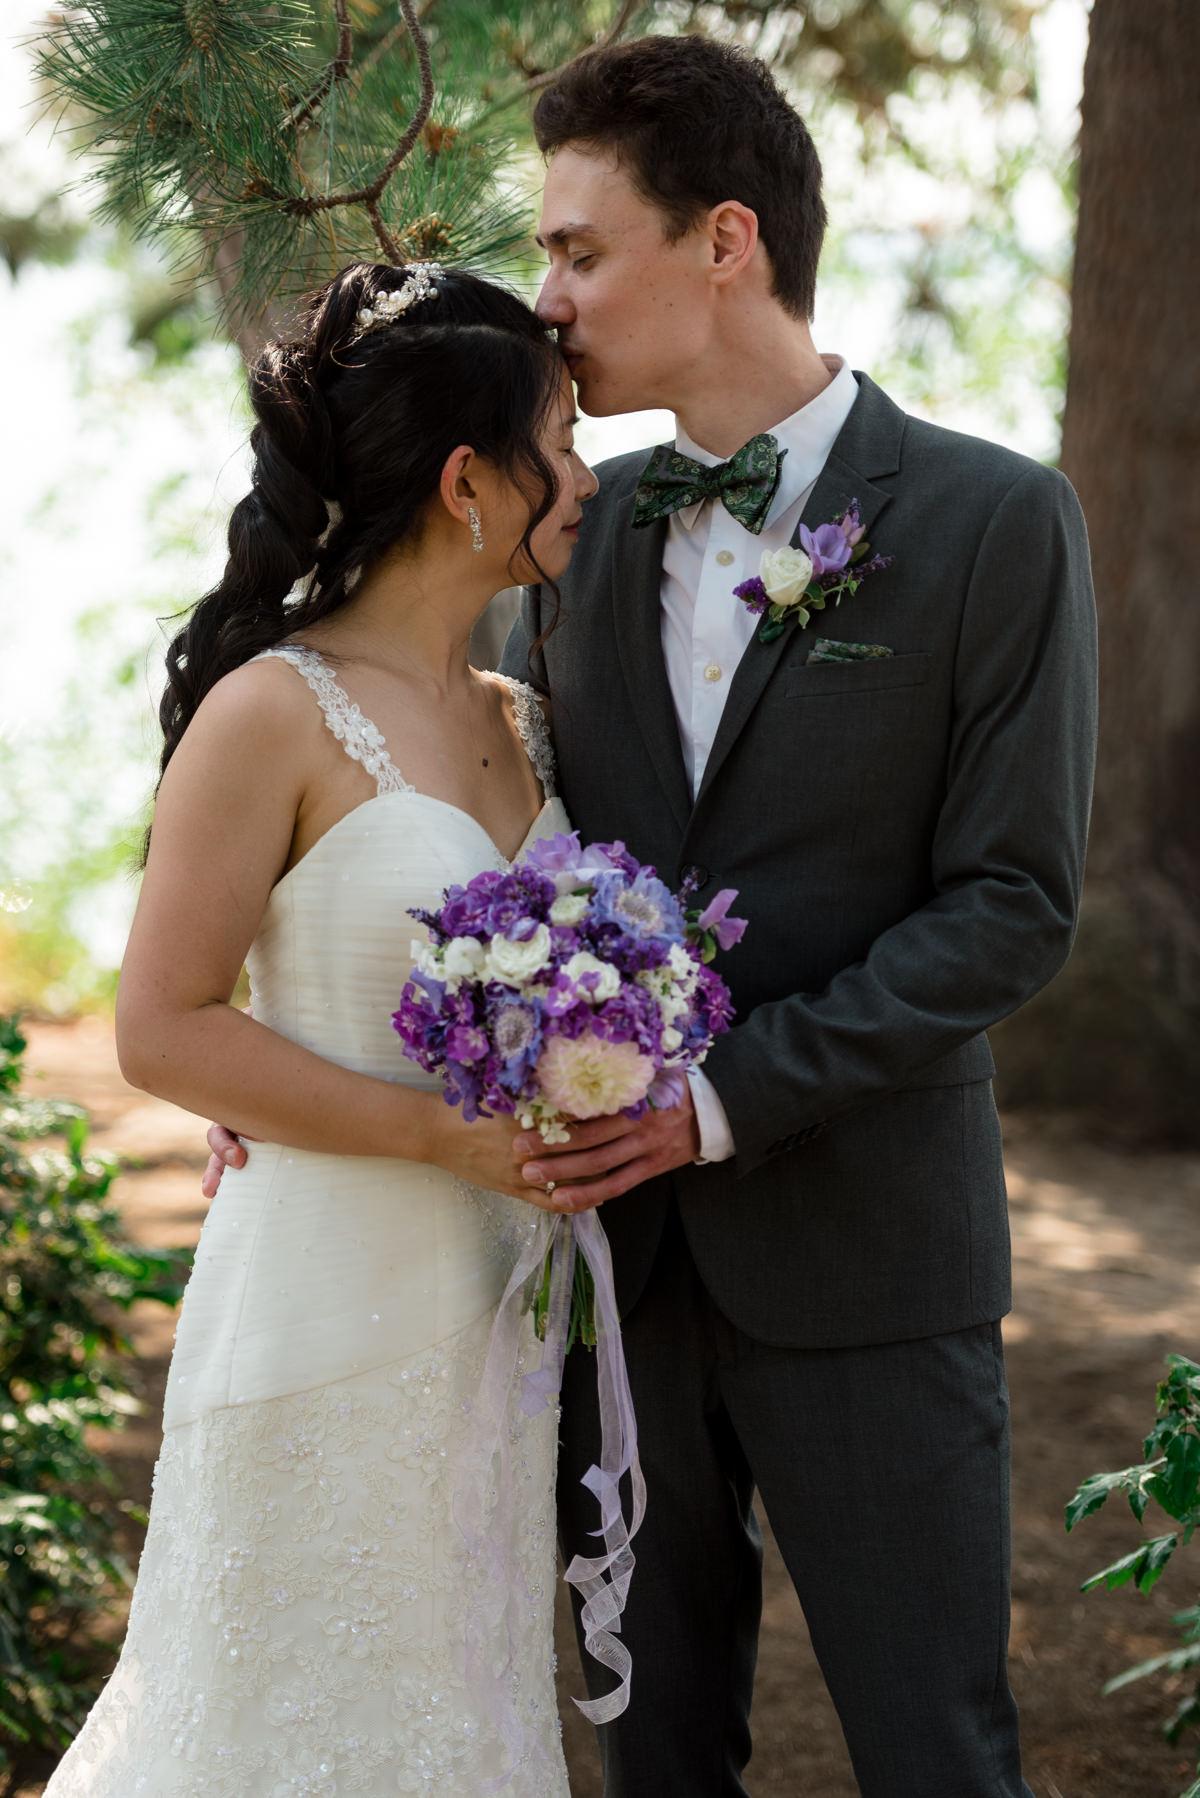 Andrew Tat - Documentary Wedding Photography - Heritage Hall - Kirkland, Washington -Grace & James - 08.jpg